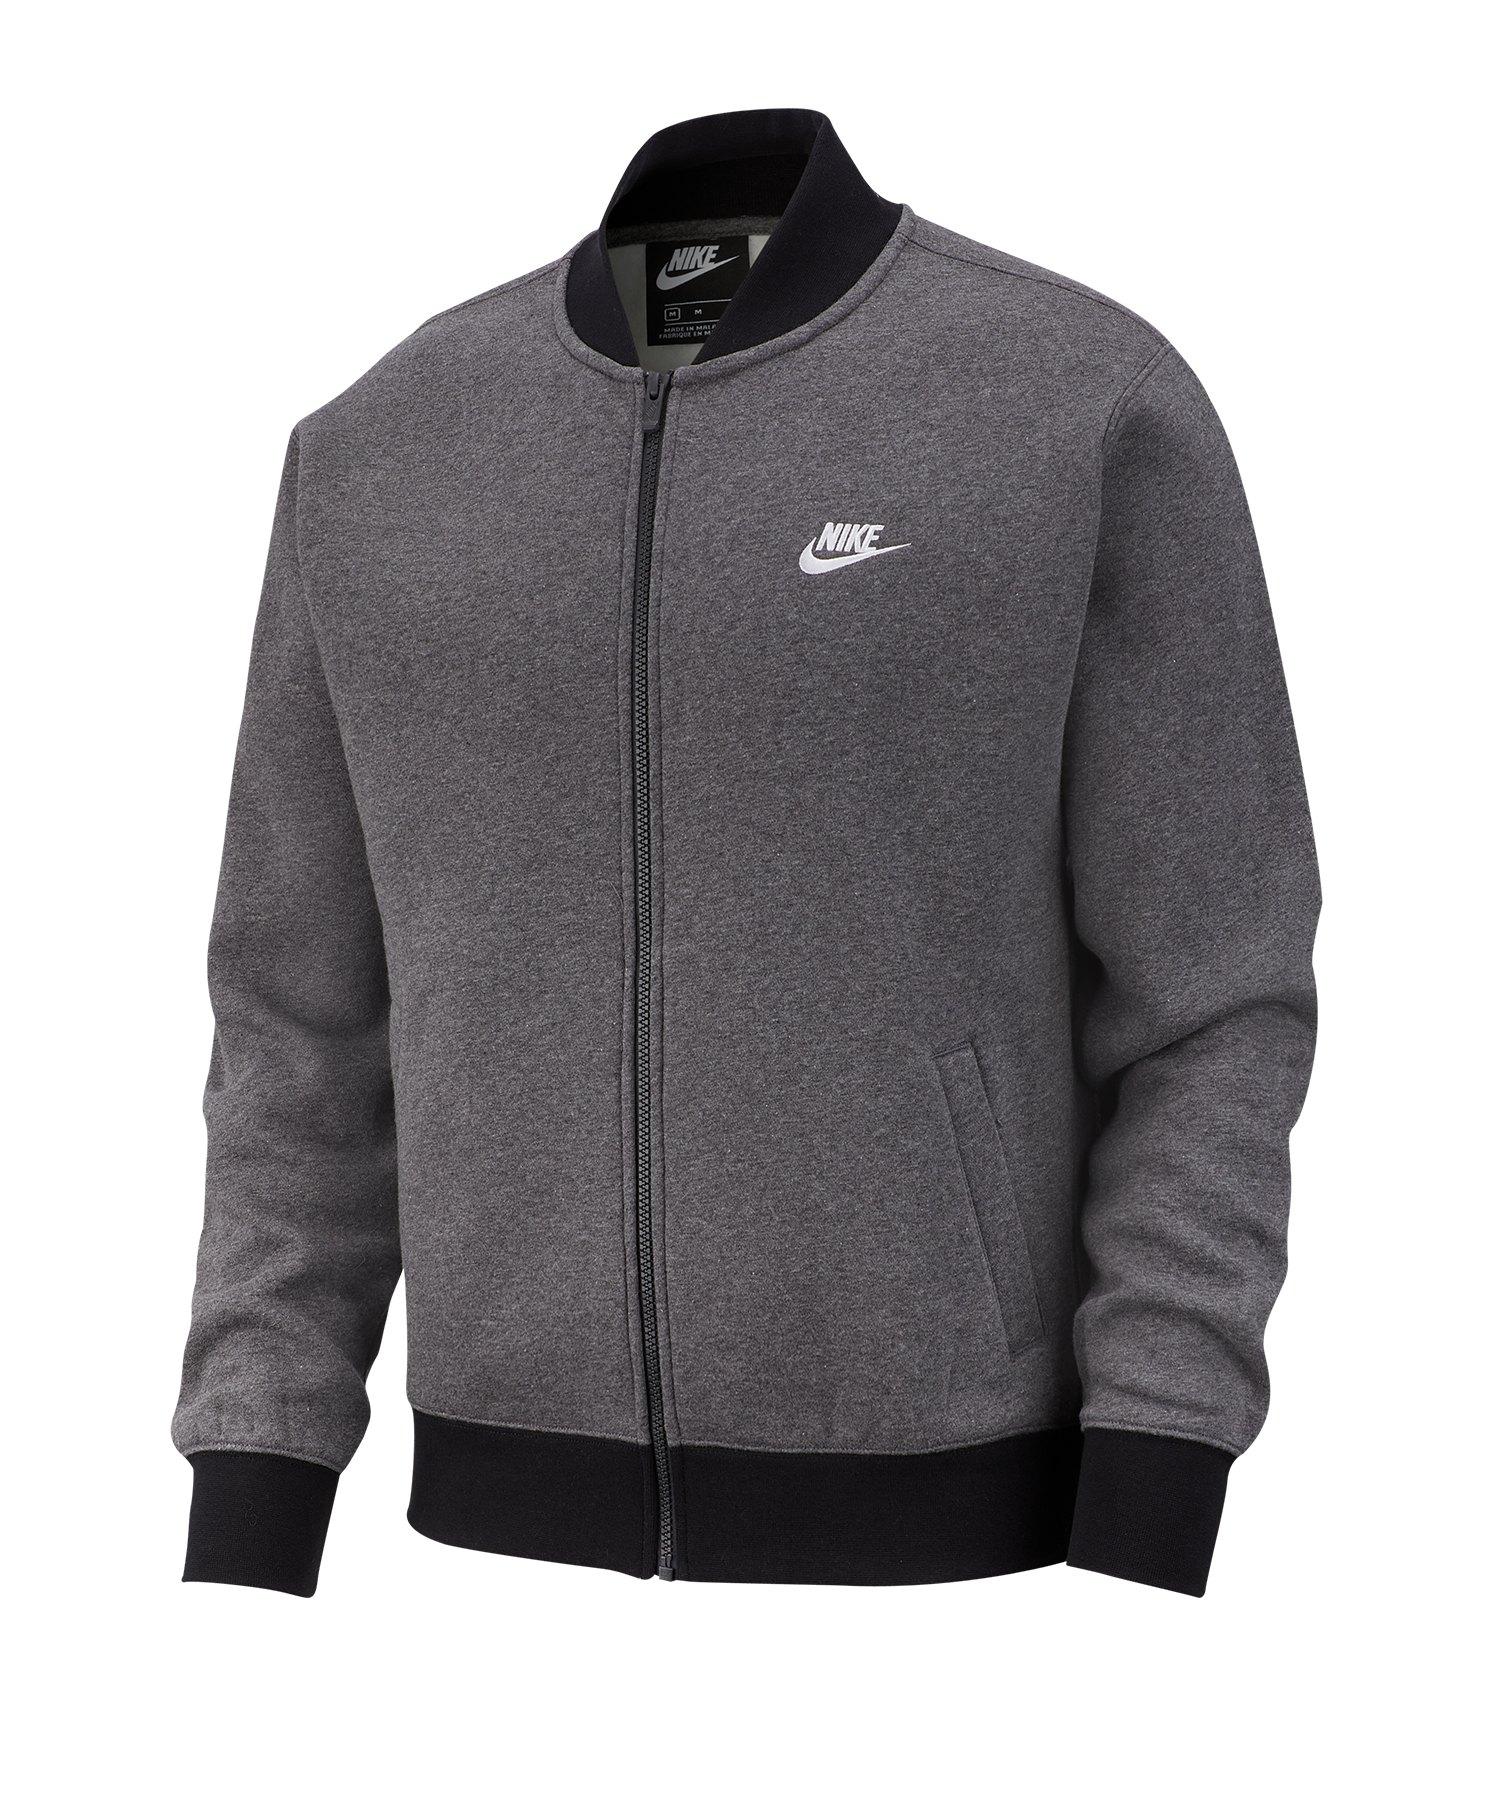 the best attitude 6bc3e d2ad4 Nike Club Fleece Bomber Jacket Jacke Grau F071